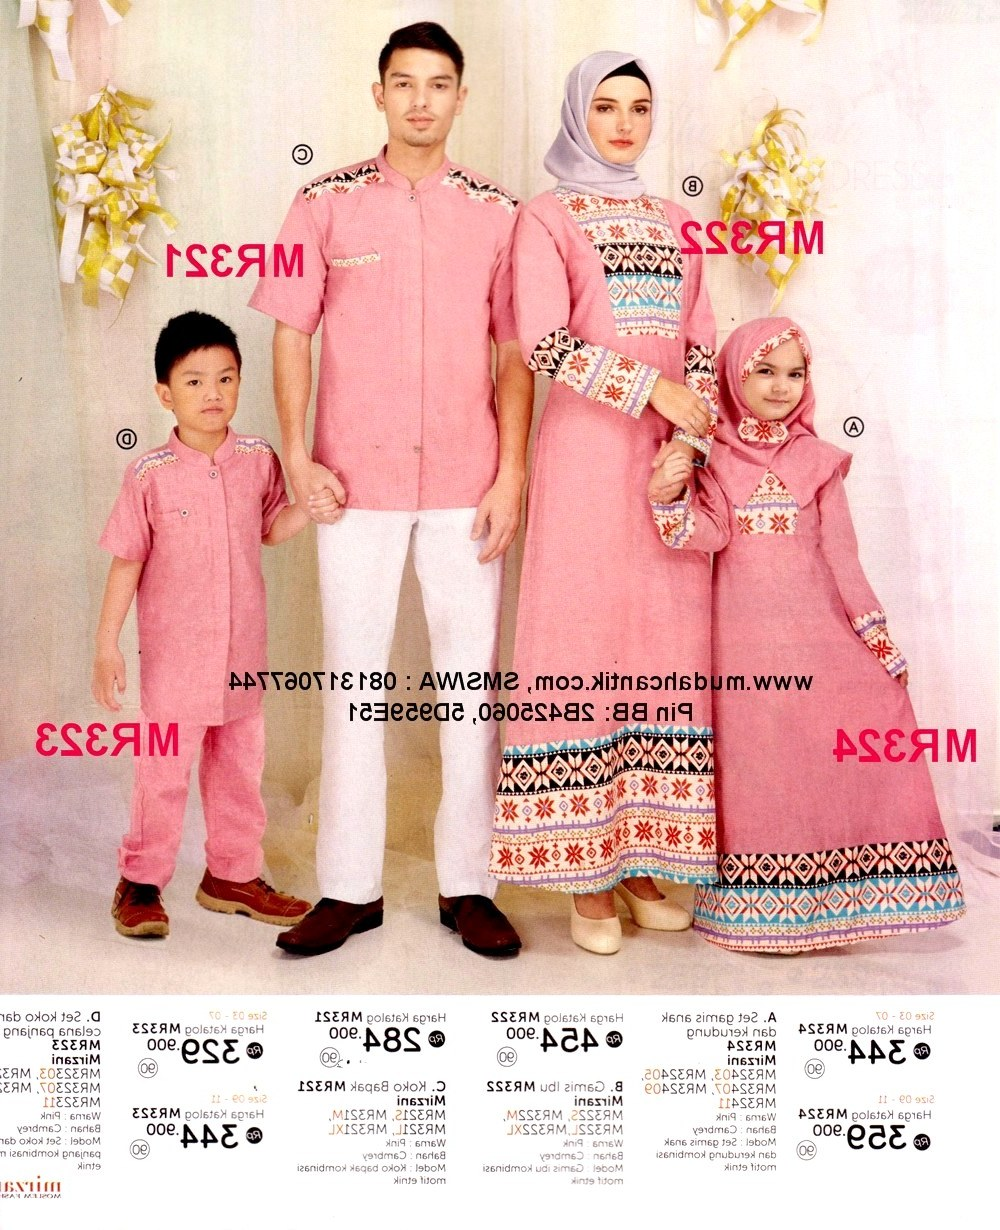 Design Baju Lebaran Anak Perempuan 2018 Whdr Model Baju Lebaran Idul Fitri 2018 Mobil You